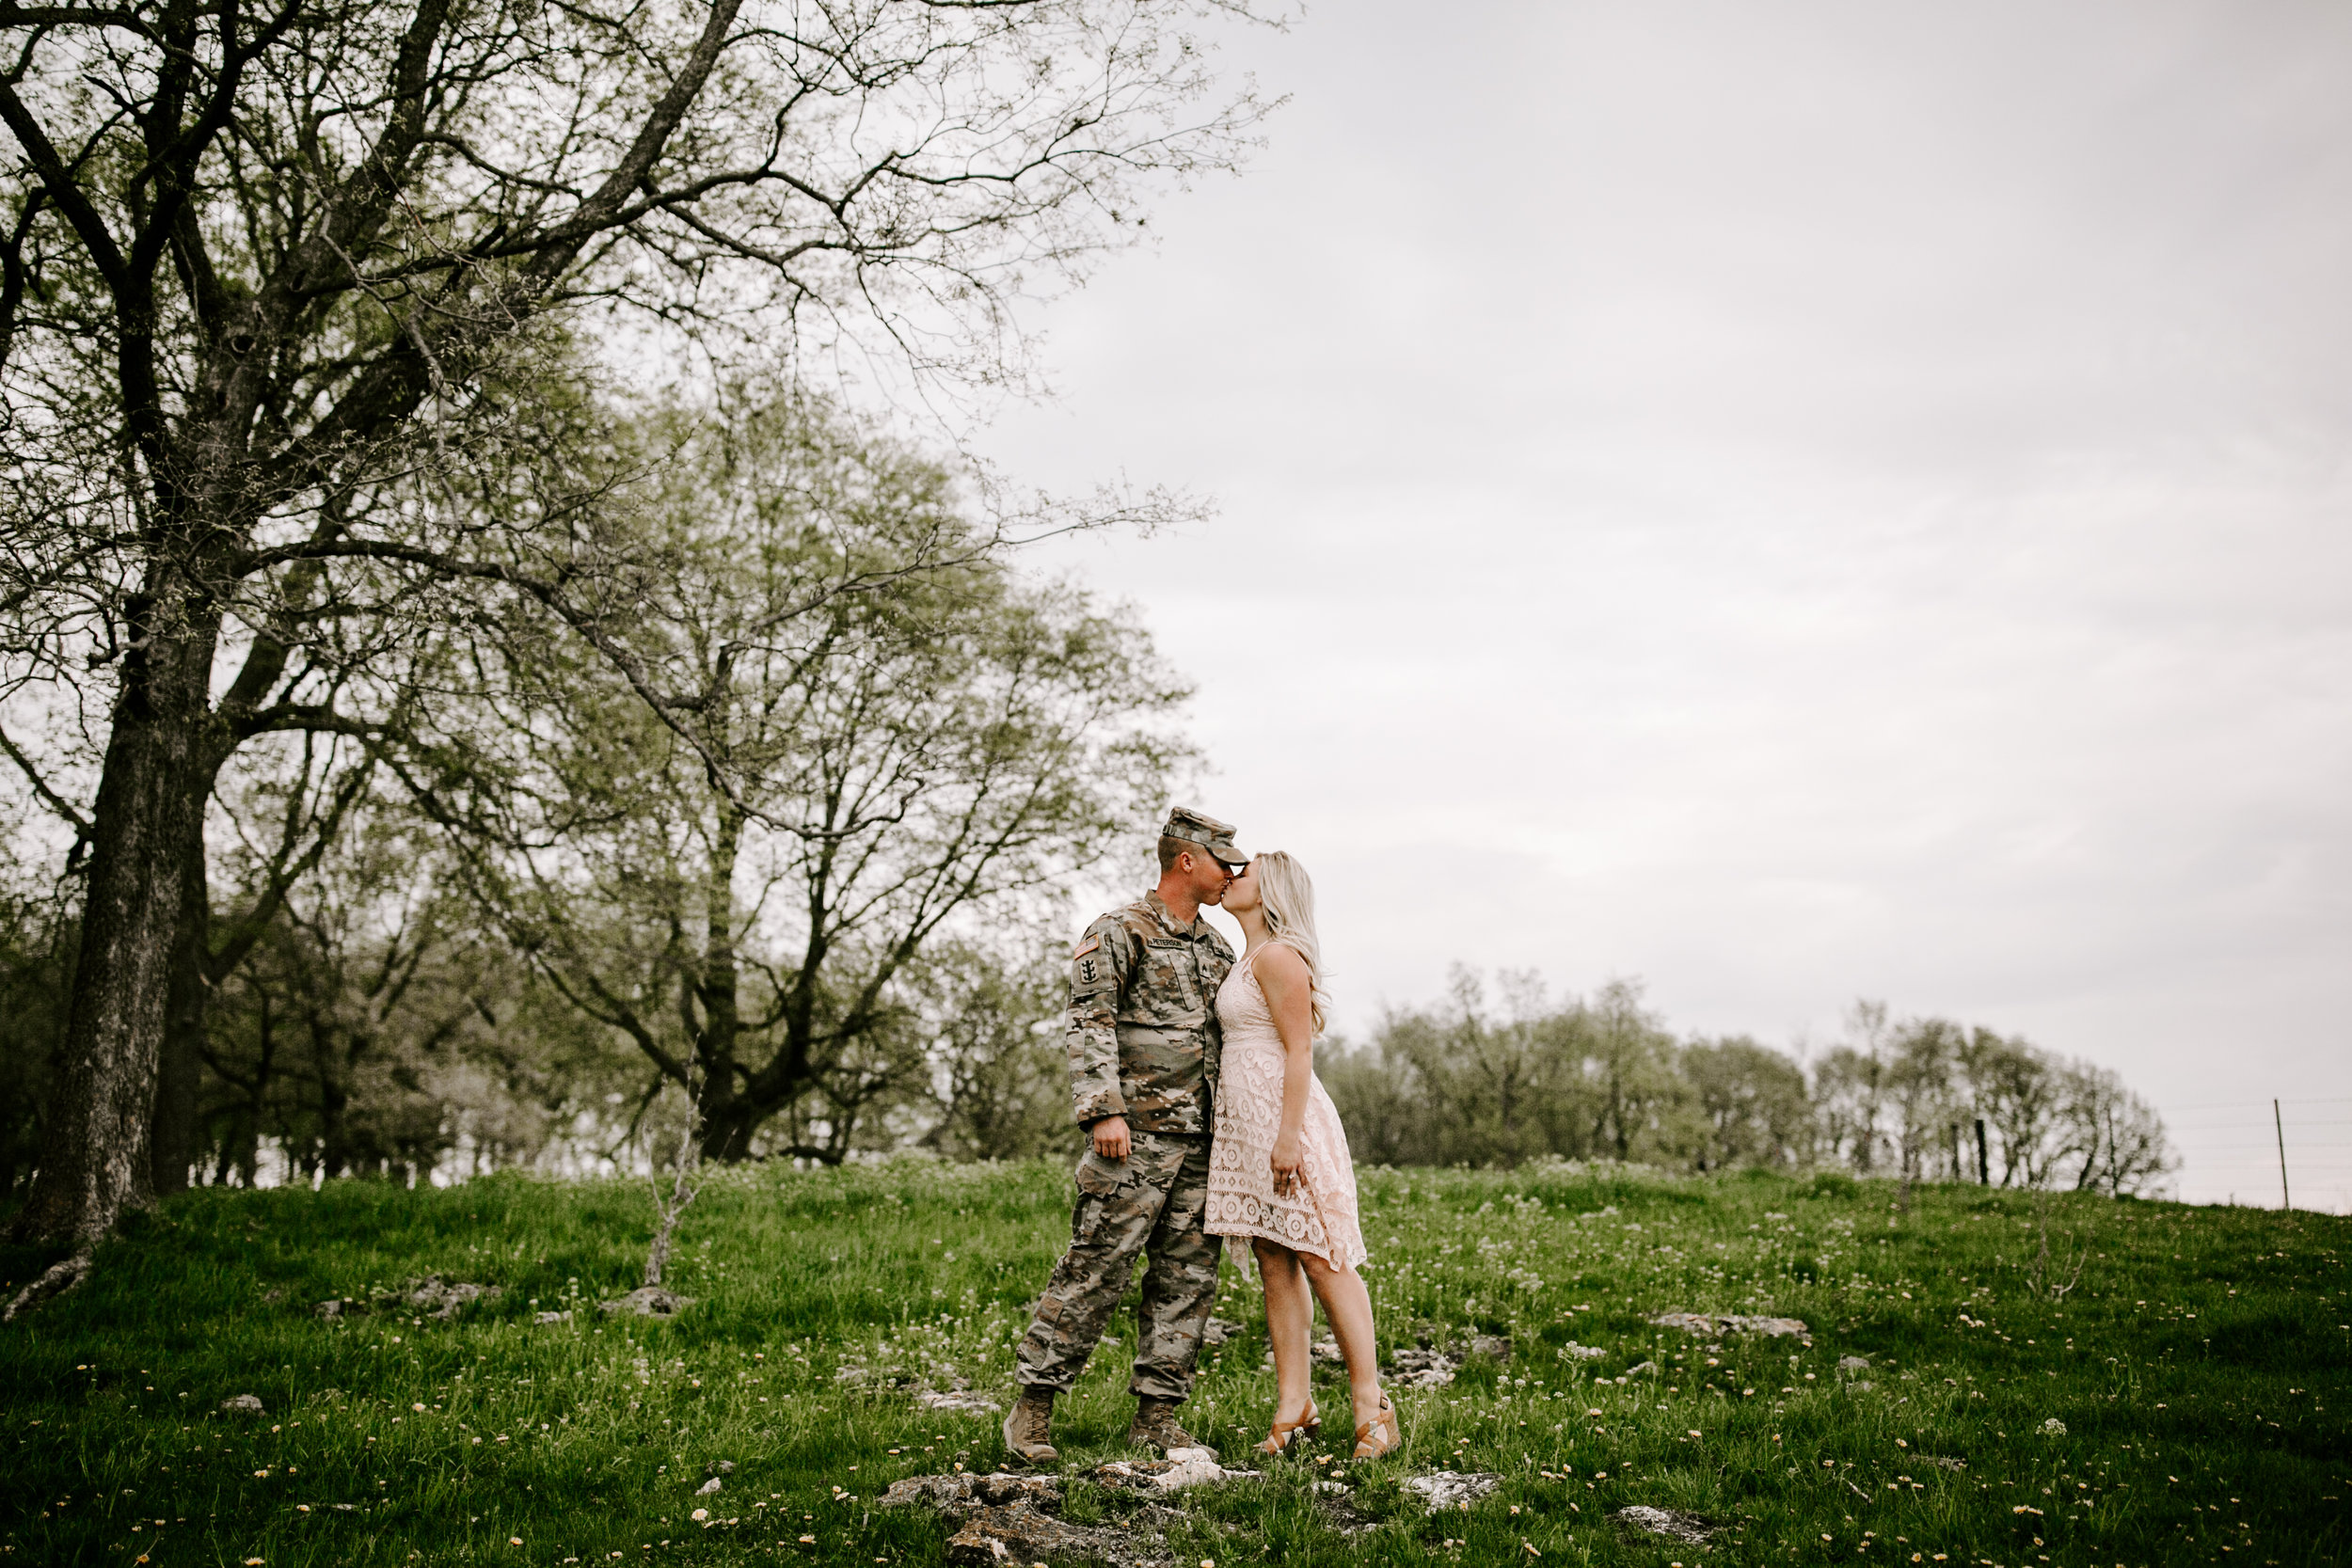 gracetphotography-wedding-photographer-adventure-bride-engagement-23.jpg